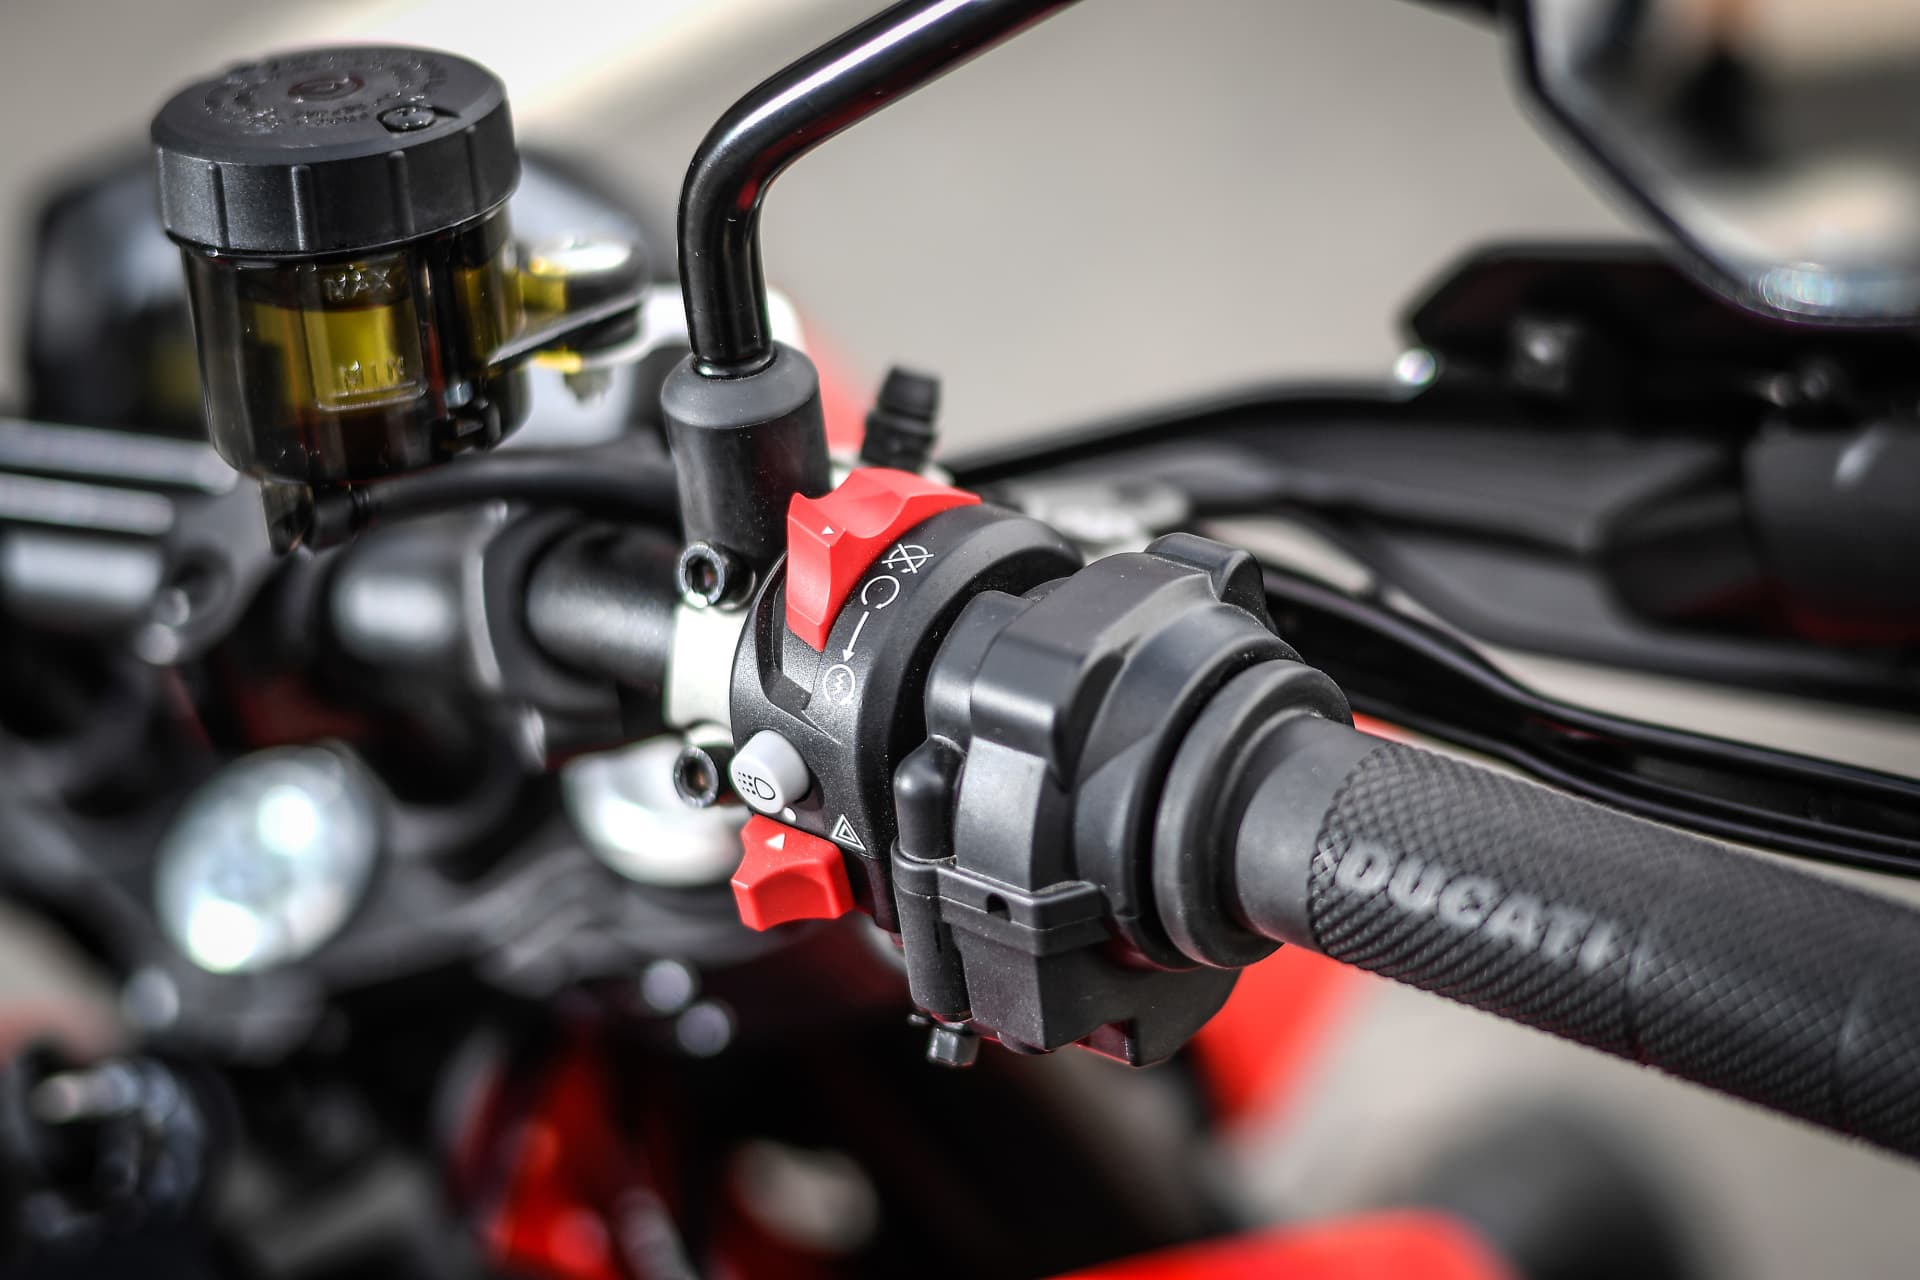 Ducati Hypermotard 950 Static 19 Uc70279 Mid